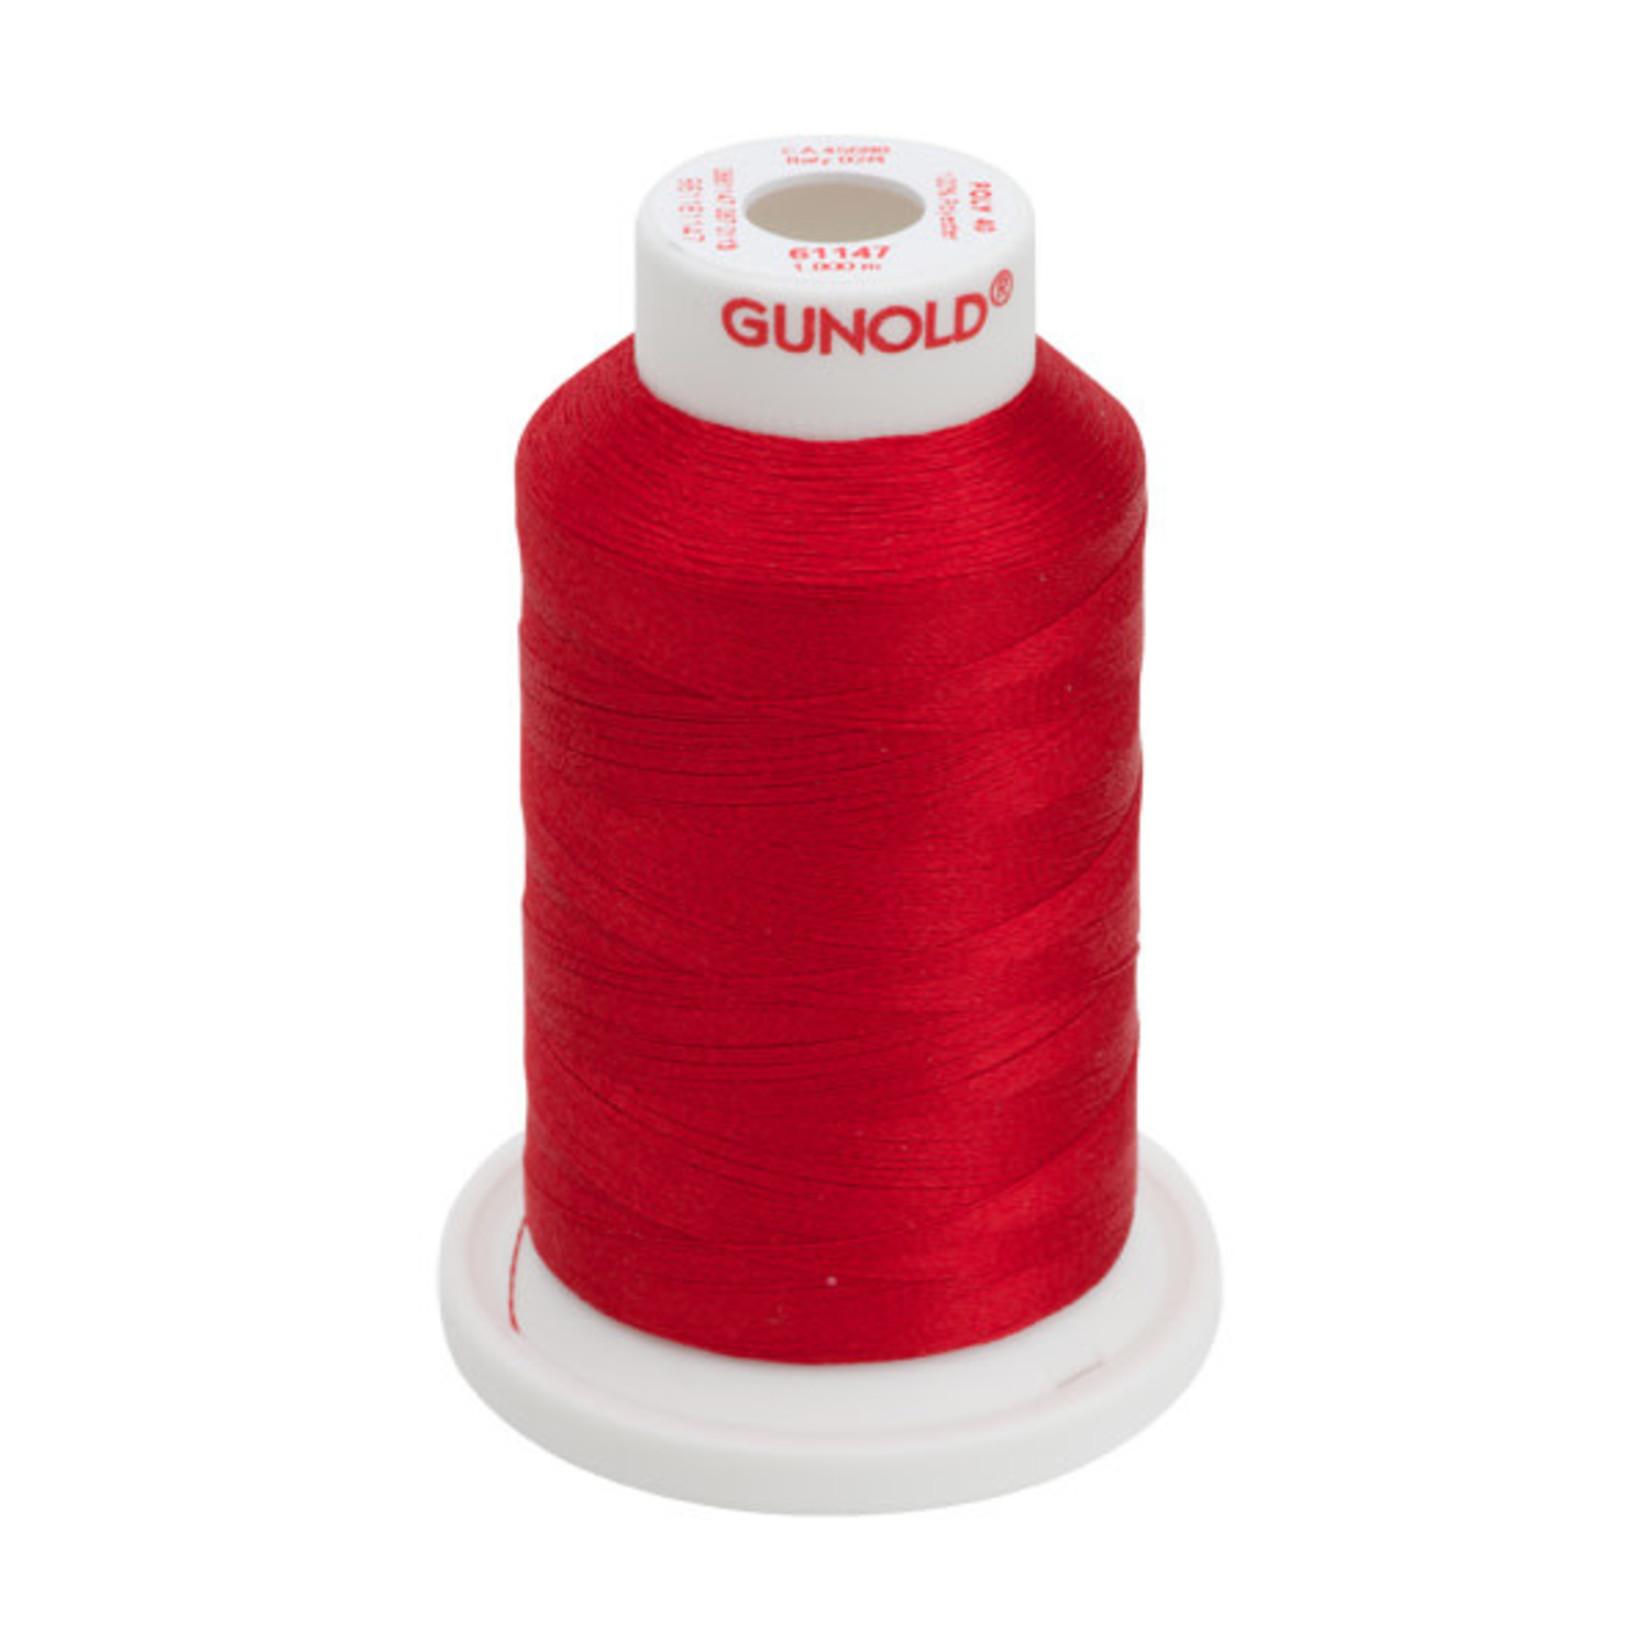 Gunold Poly 40 WT 61147 Xmas Red 1000m